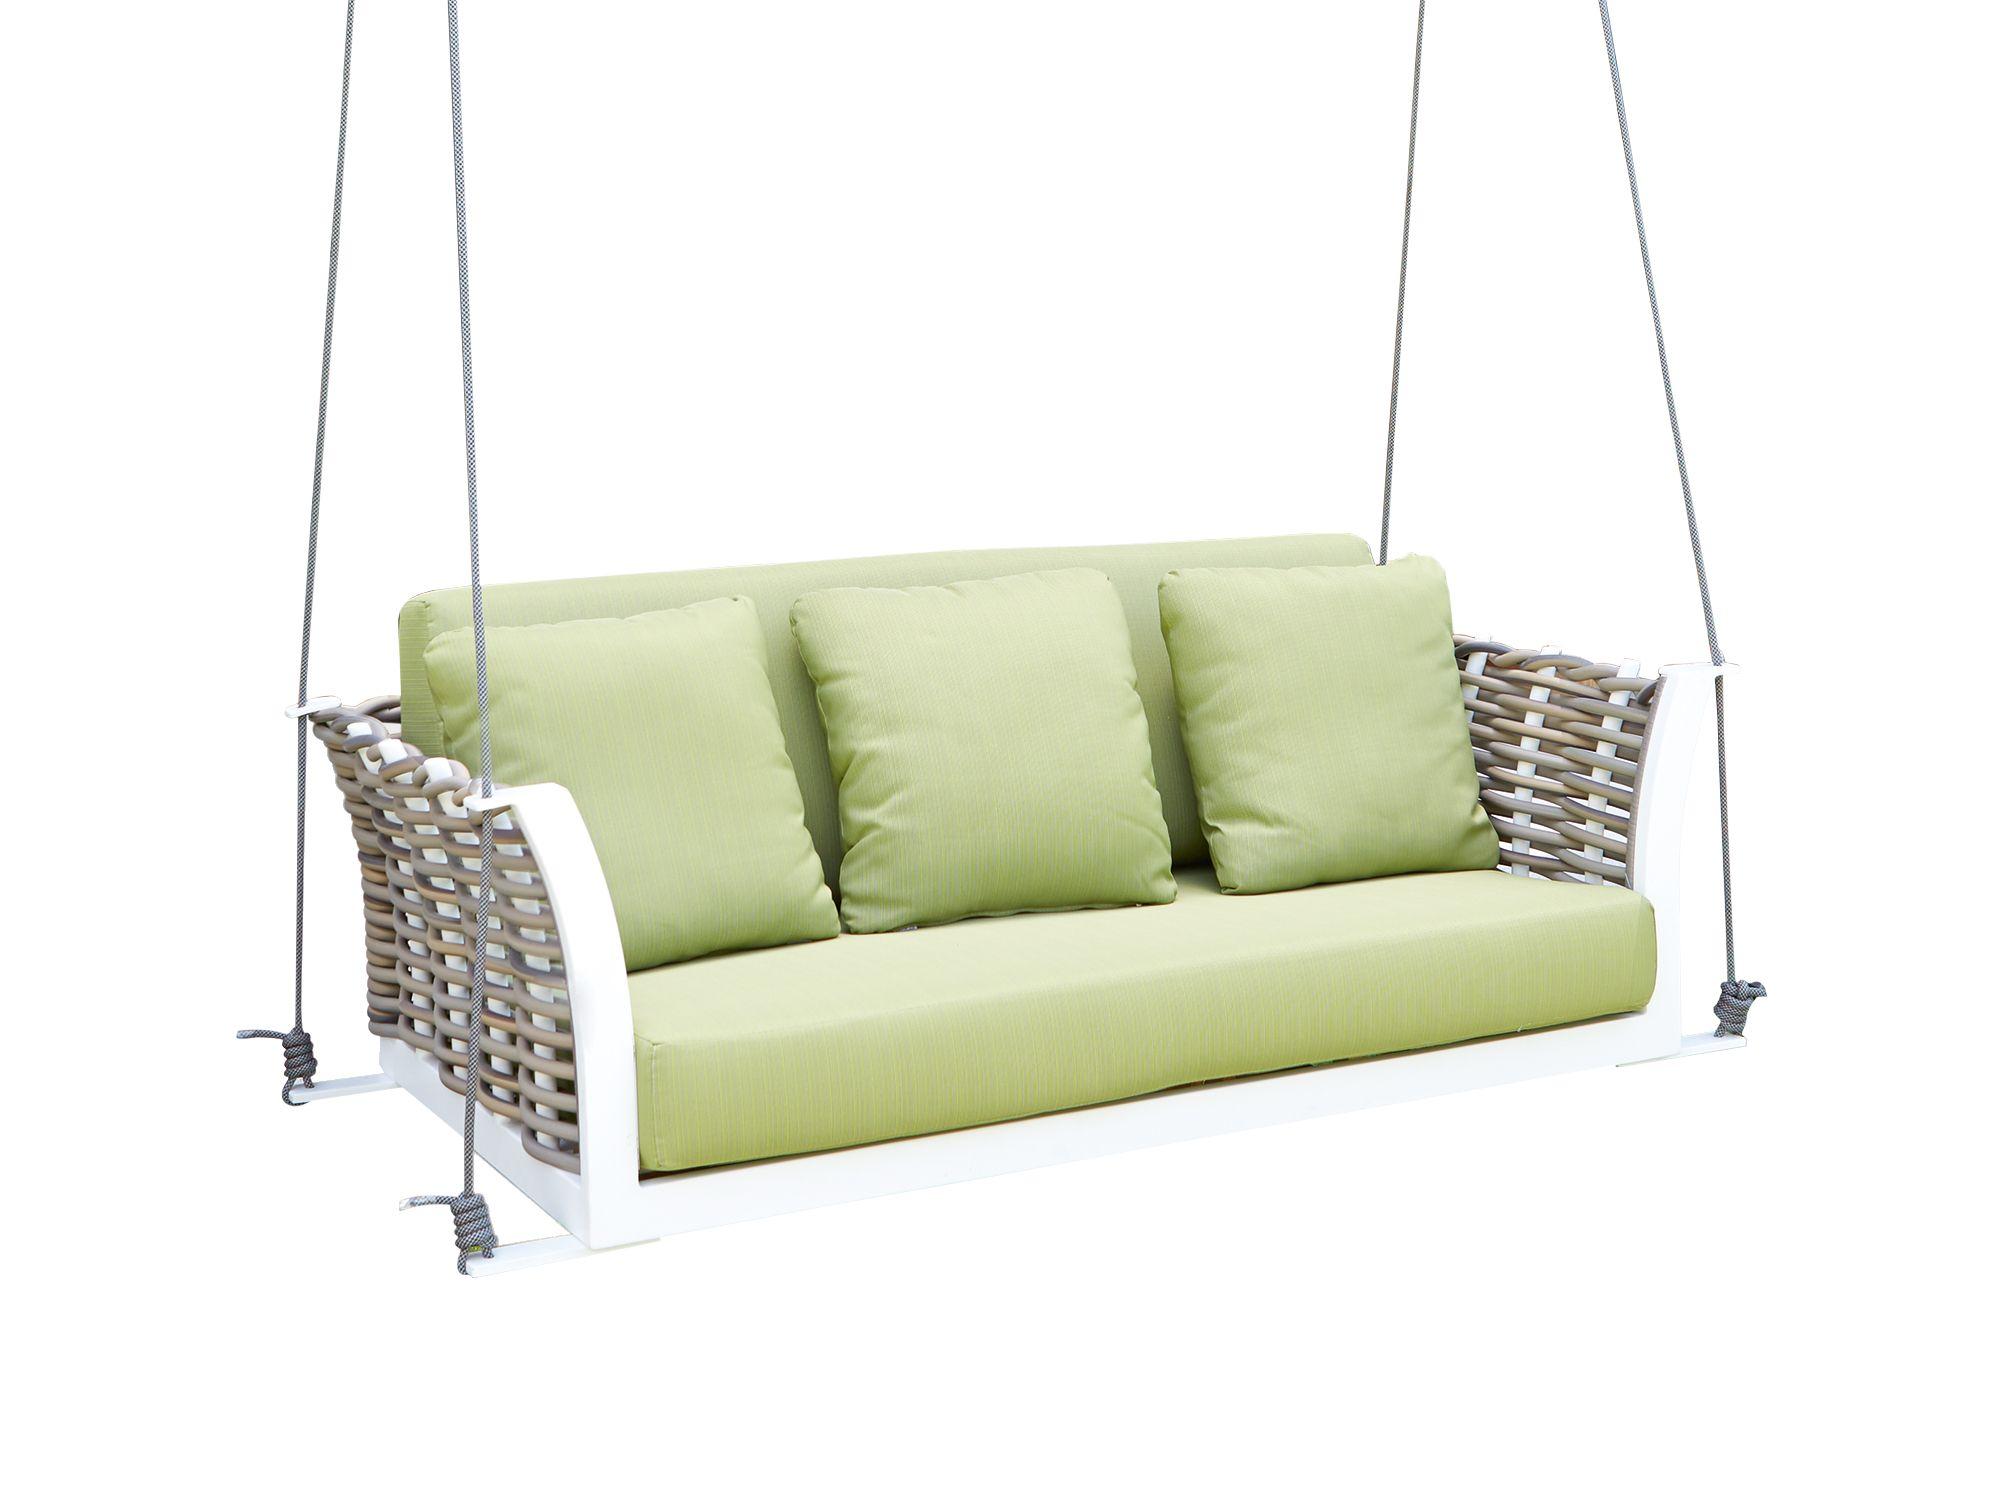 Garden hanging chairs Outdoor furniture